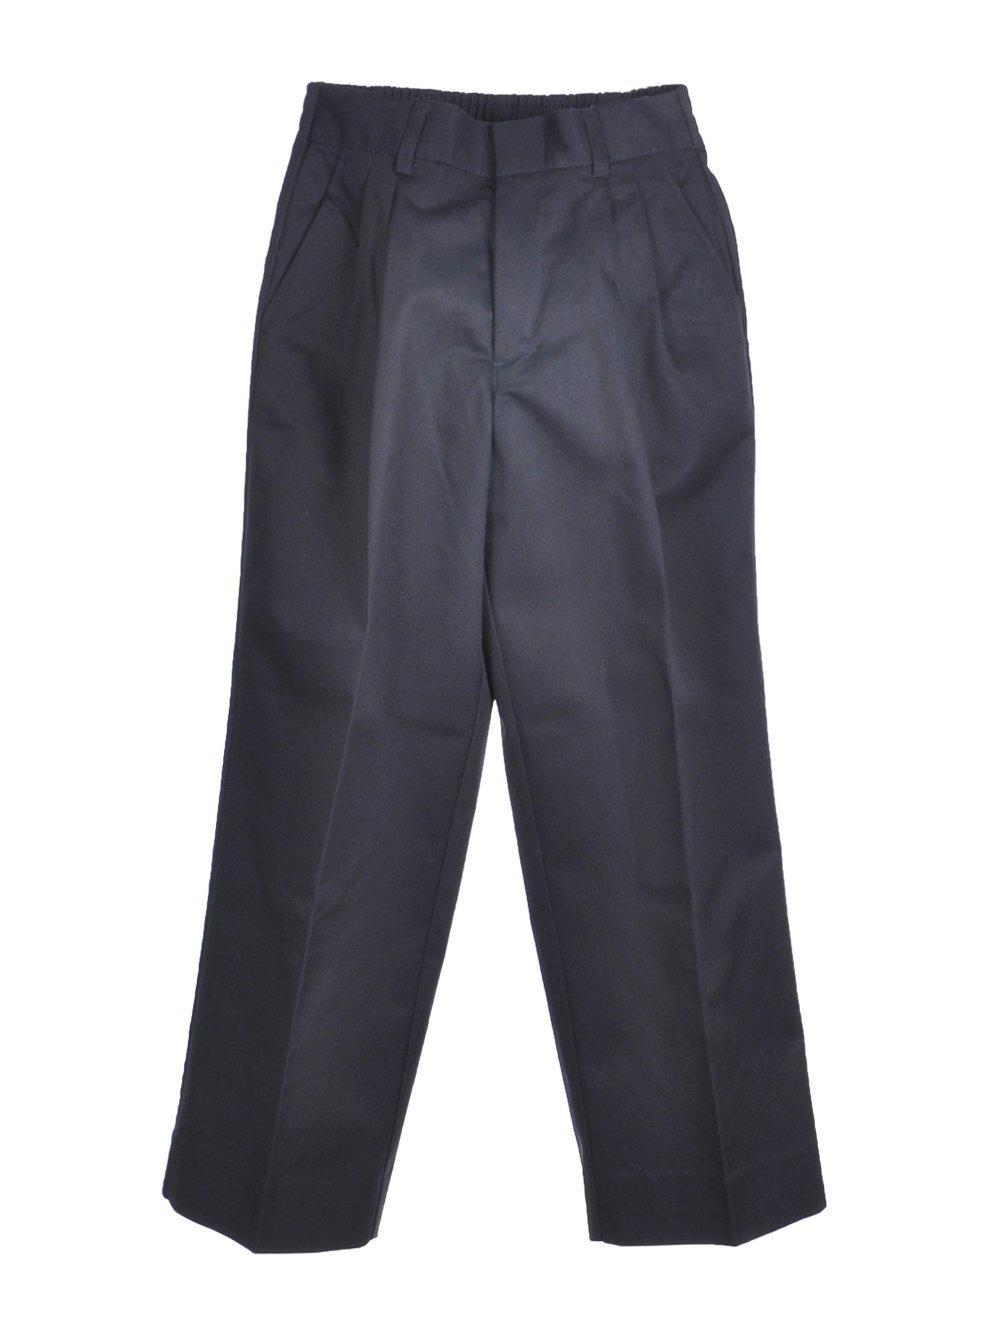 Cookie's Brand Big Boys' Pleated Pants - navy, 16